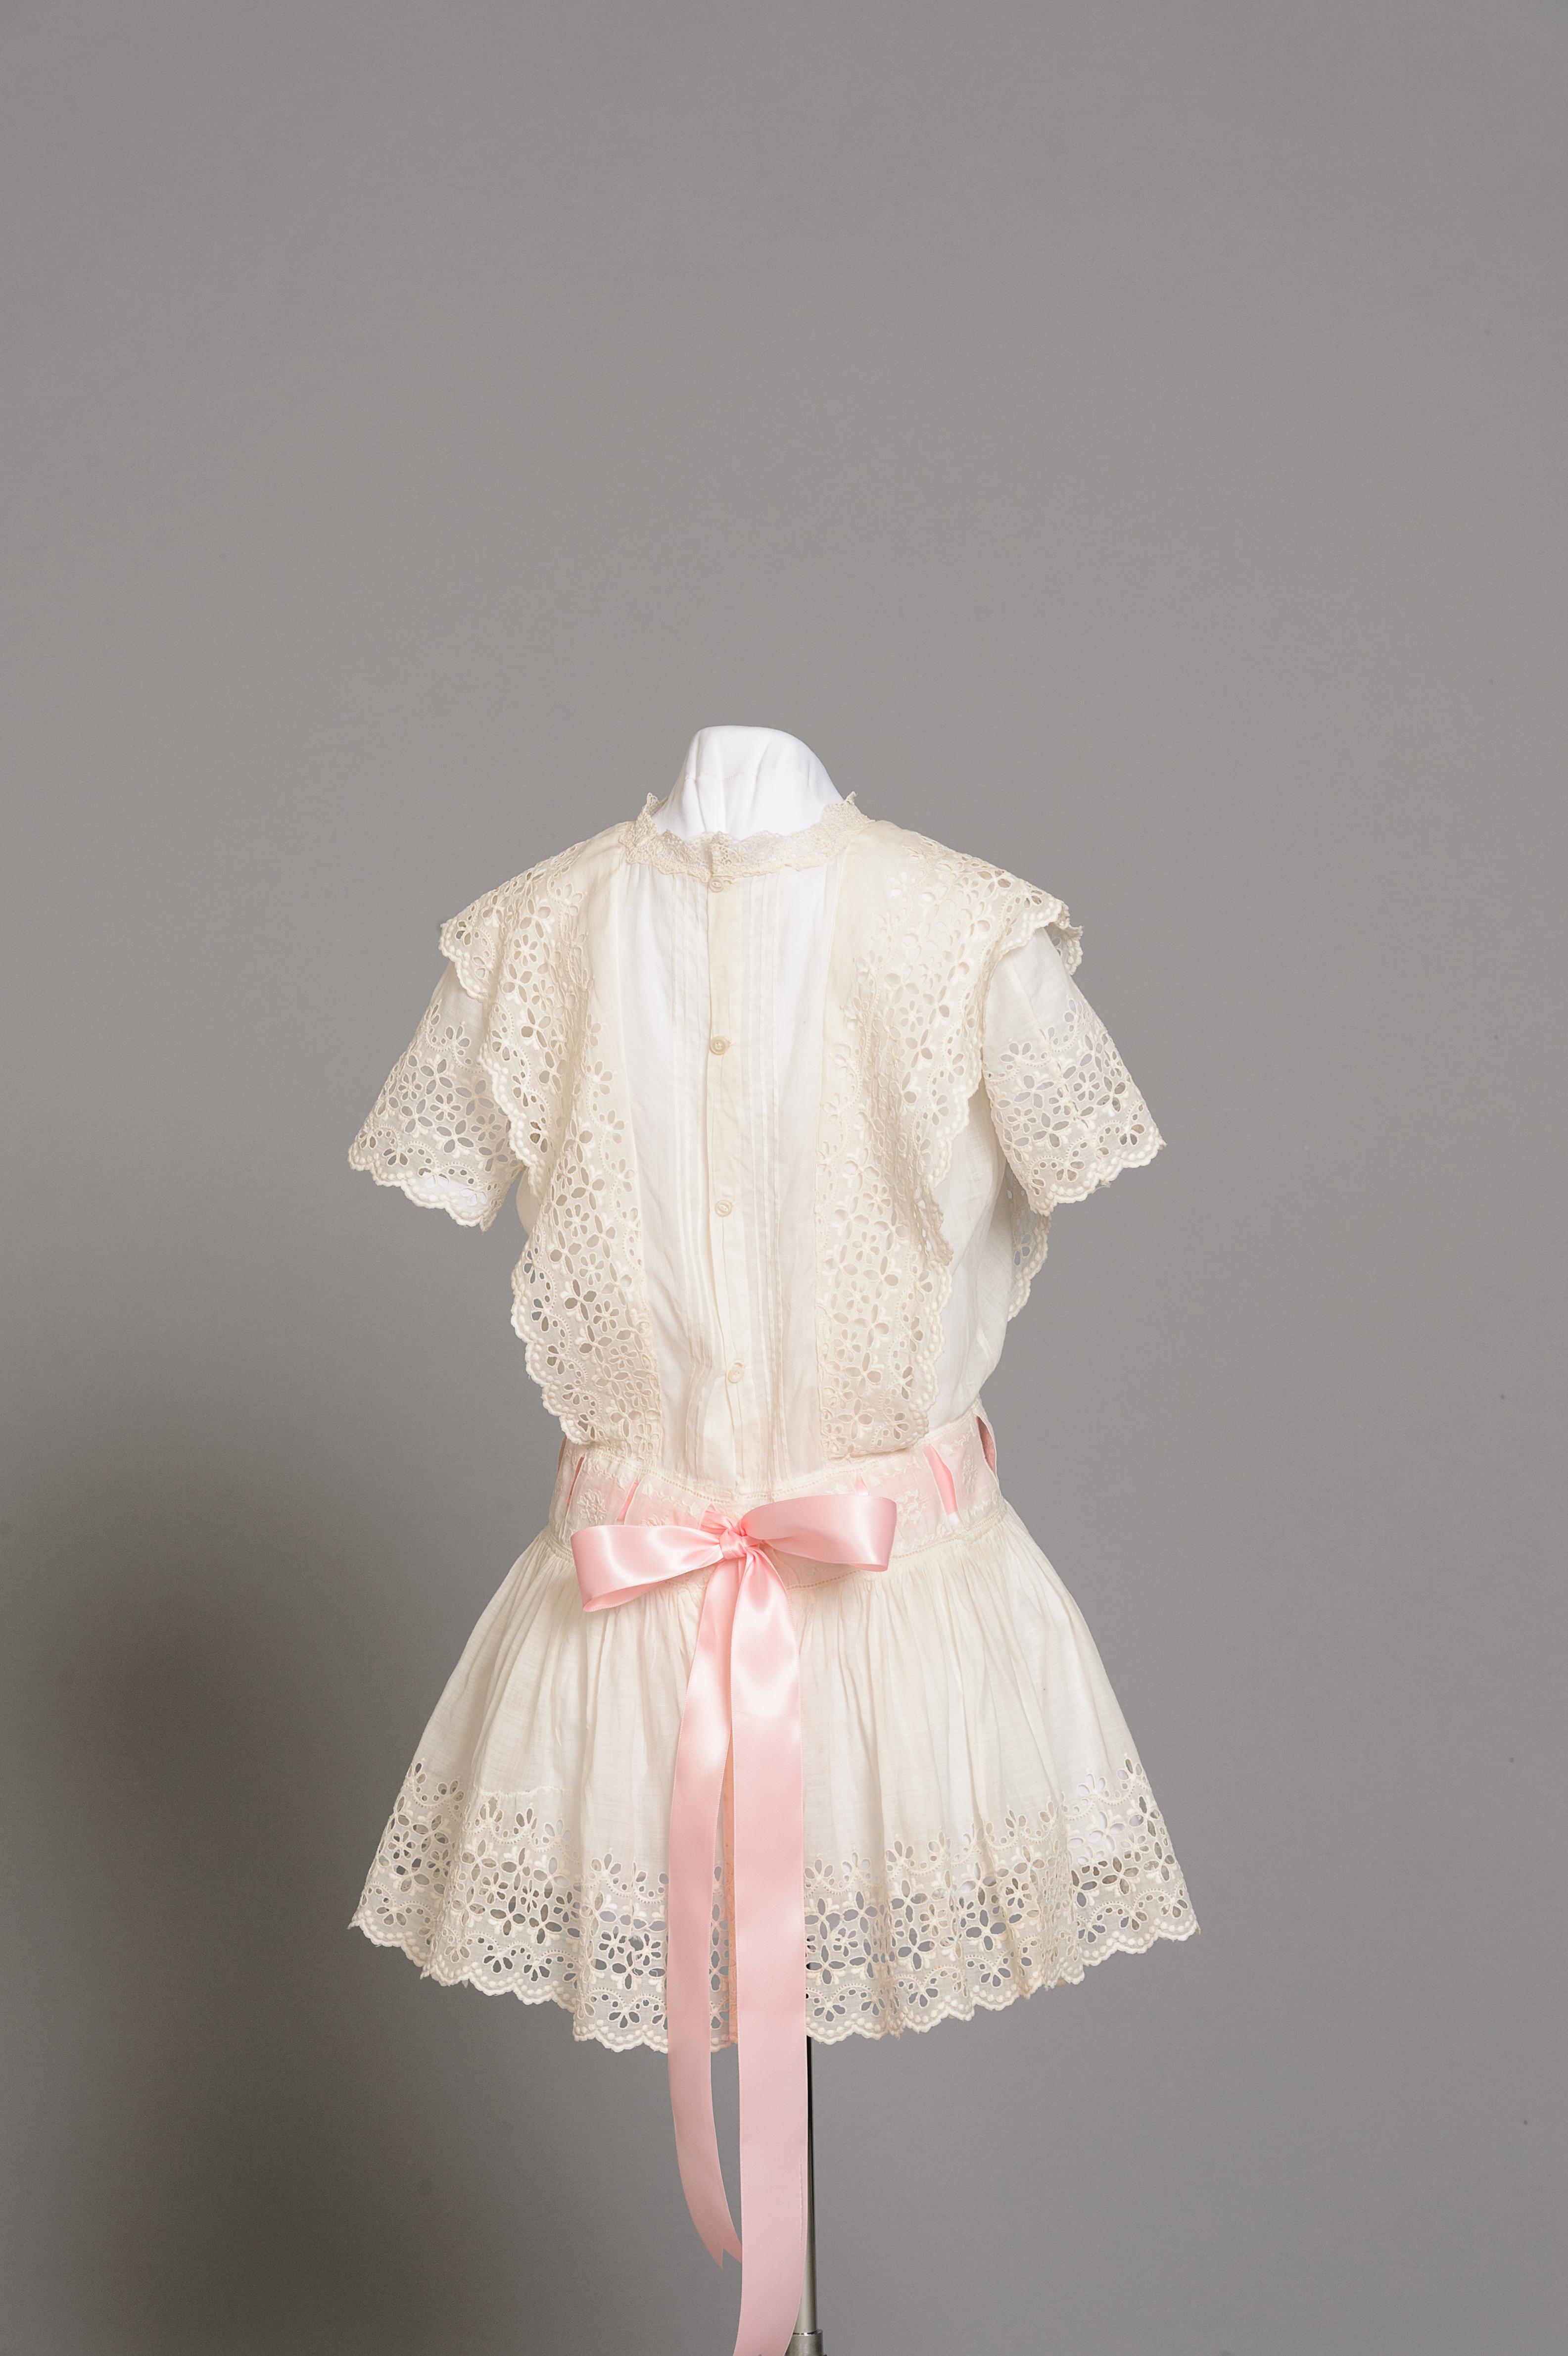 Fashion and Satire: Cotton Child's Dress